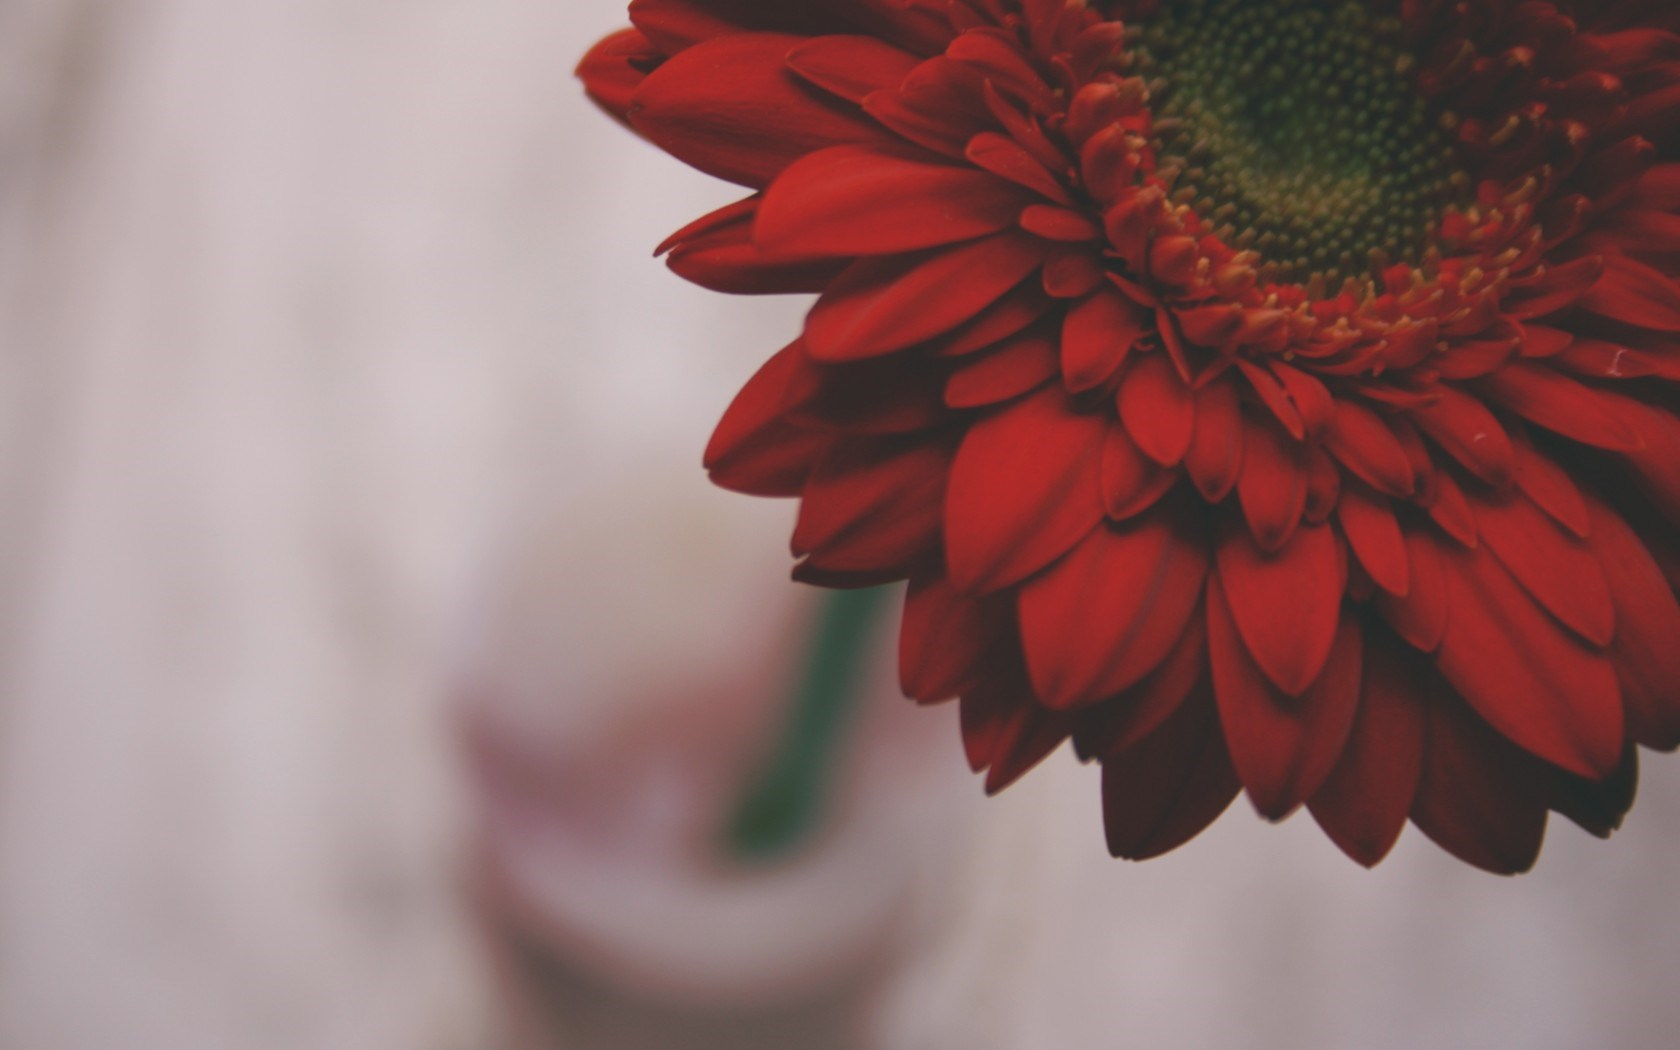 Red flower wallpaper hd